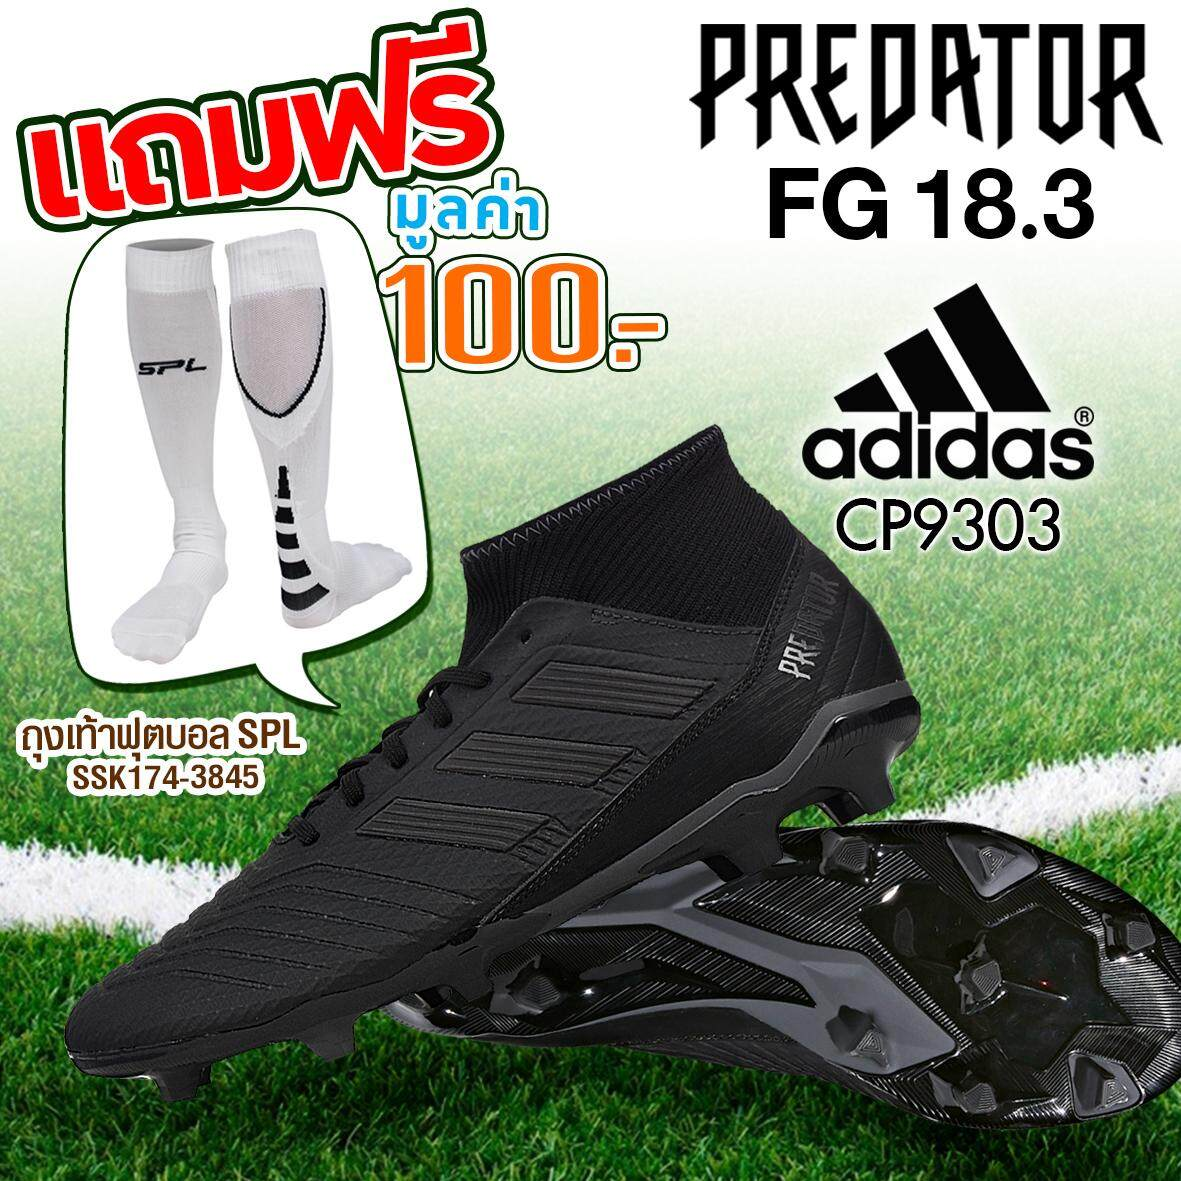 c91b26a3c650 Adidas รองเท้า ฟุตบอล อดิดาส Football Shoe Predator 18.3 FIRM GROUND CLEATS  CP9303 (3200) แถมฟรี ถุงเท้าฟุตบอล Striker 17.4 สีขาว – มาช้อปกัน.คอม